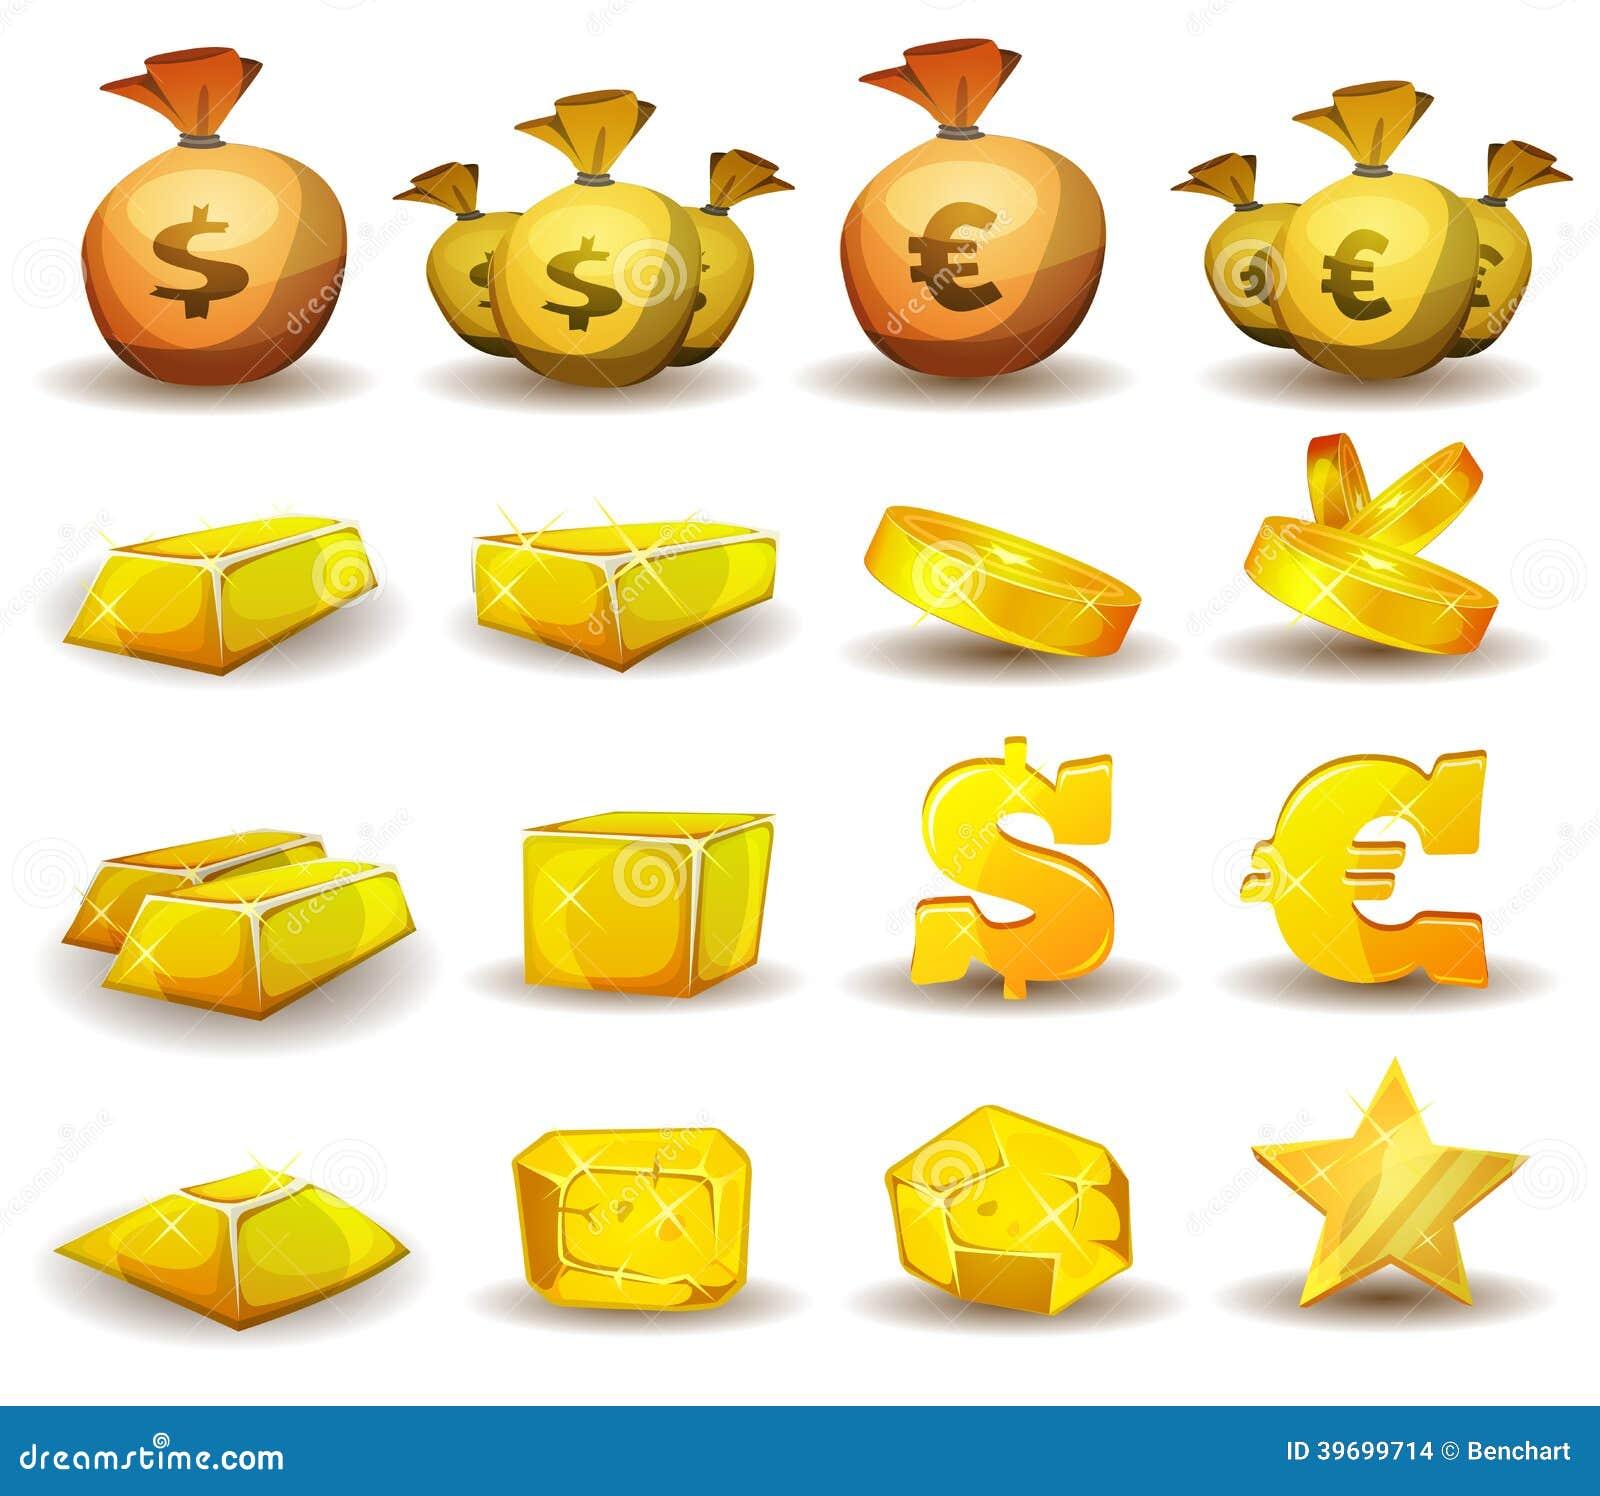 Bag of gold coins cartoon